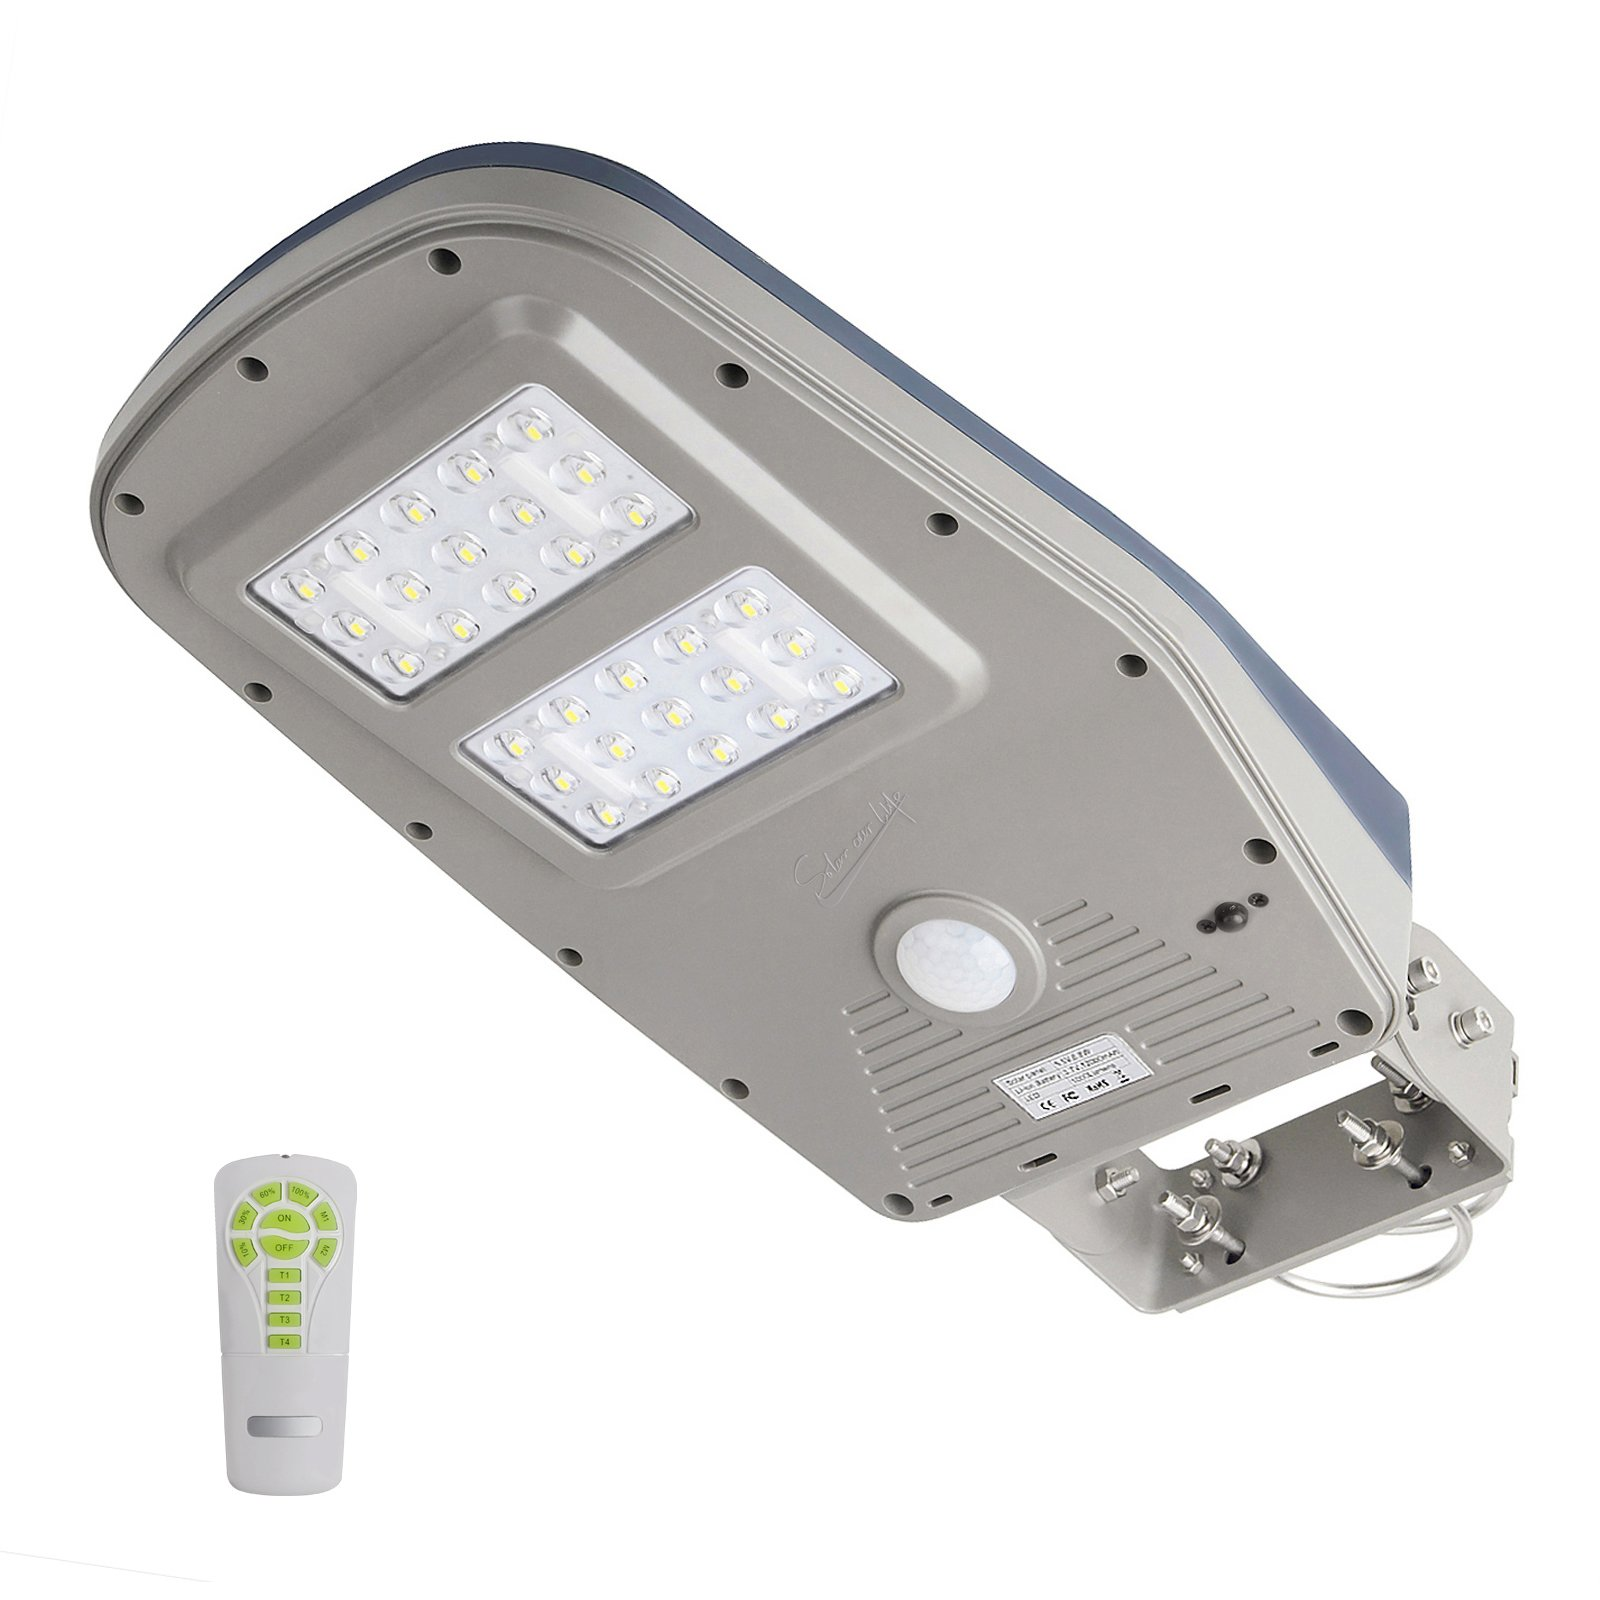 GBGS Solar Street Light Outdoor 1,000 Lumens IP65 with Remote Wall Mount Area Lighting Dusk to Dawn PIR Motion Sensor Courtyard Deck Night Lights, 30 LEDs